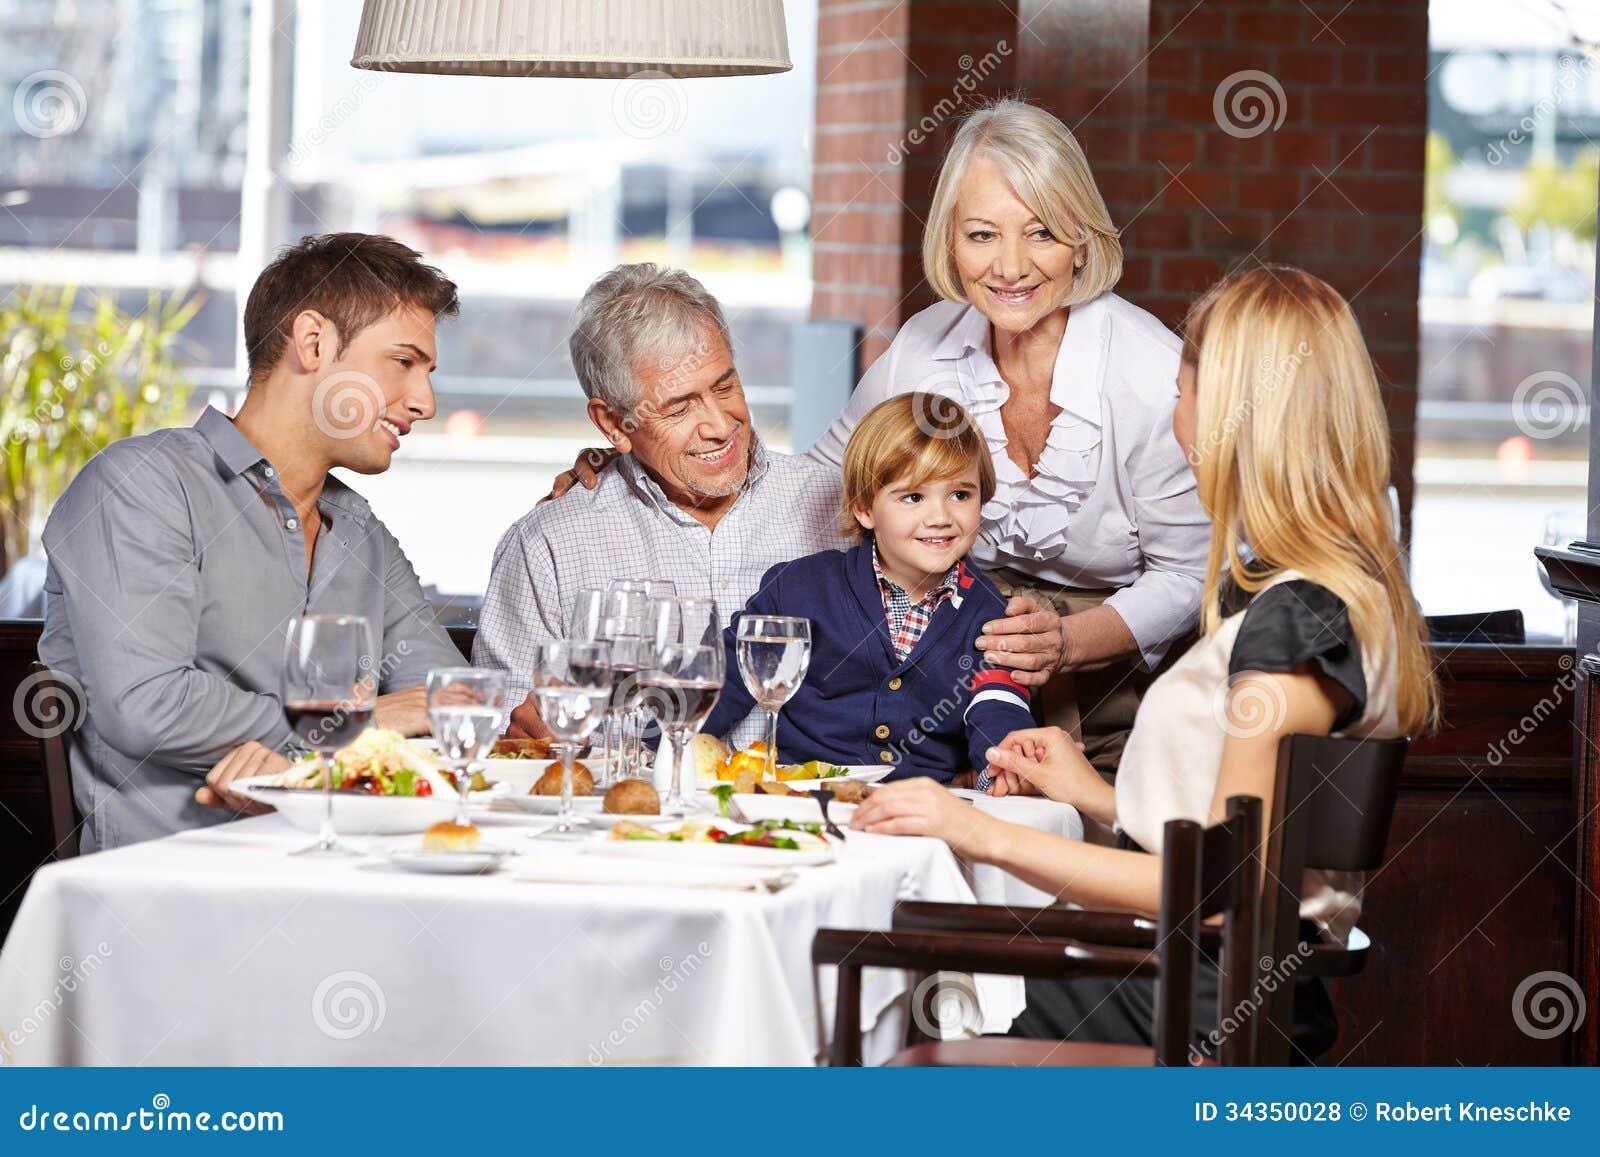 Happy Family Sitting In Restaurant